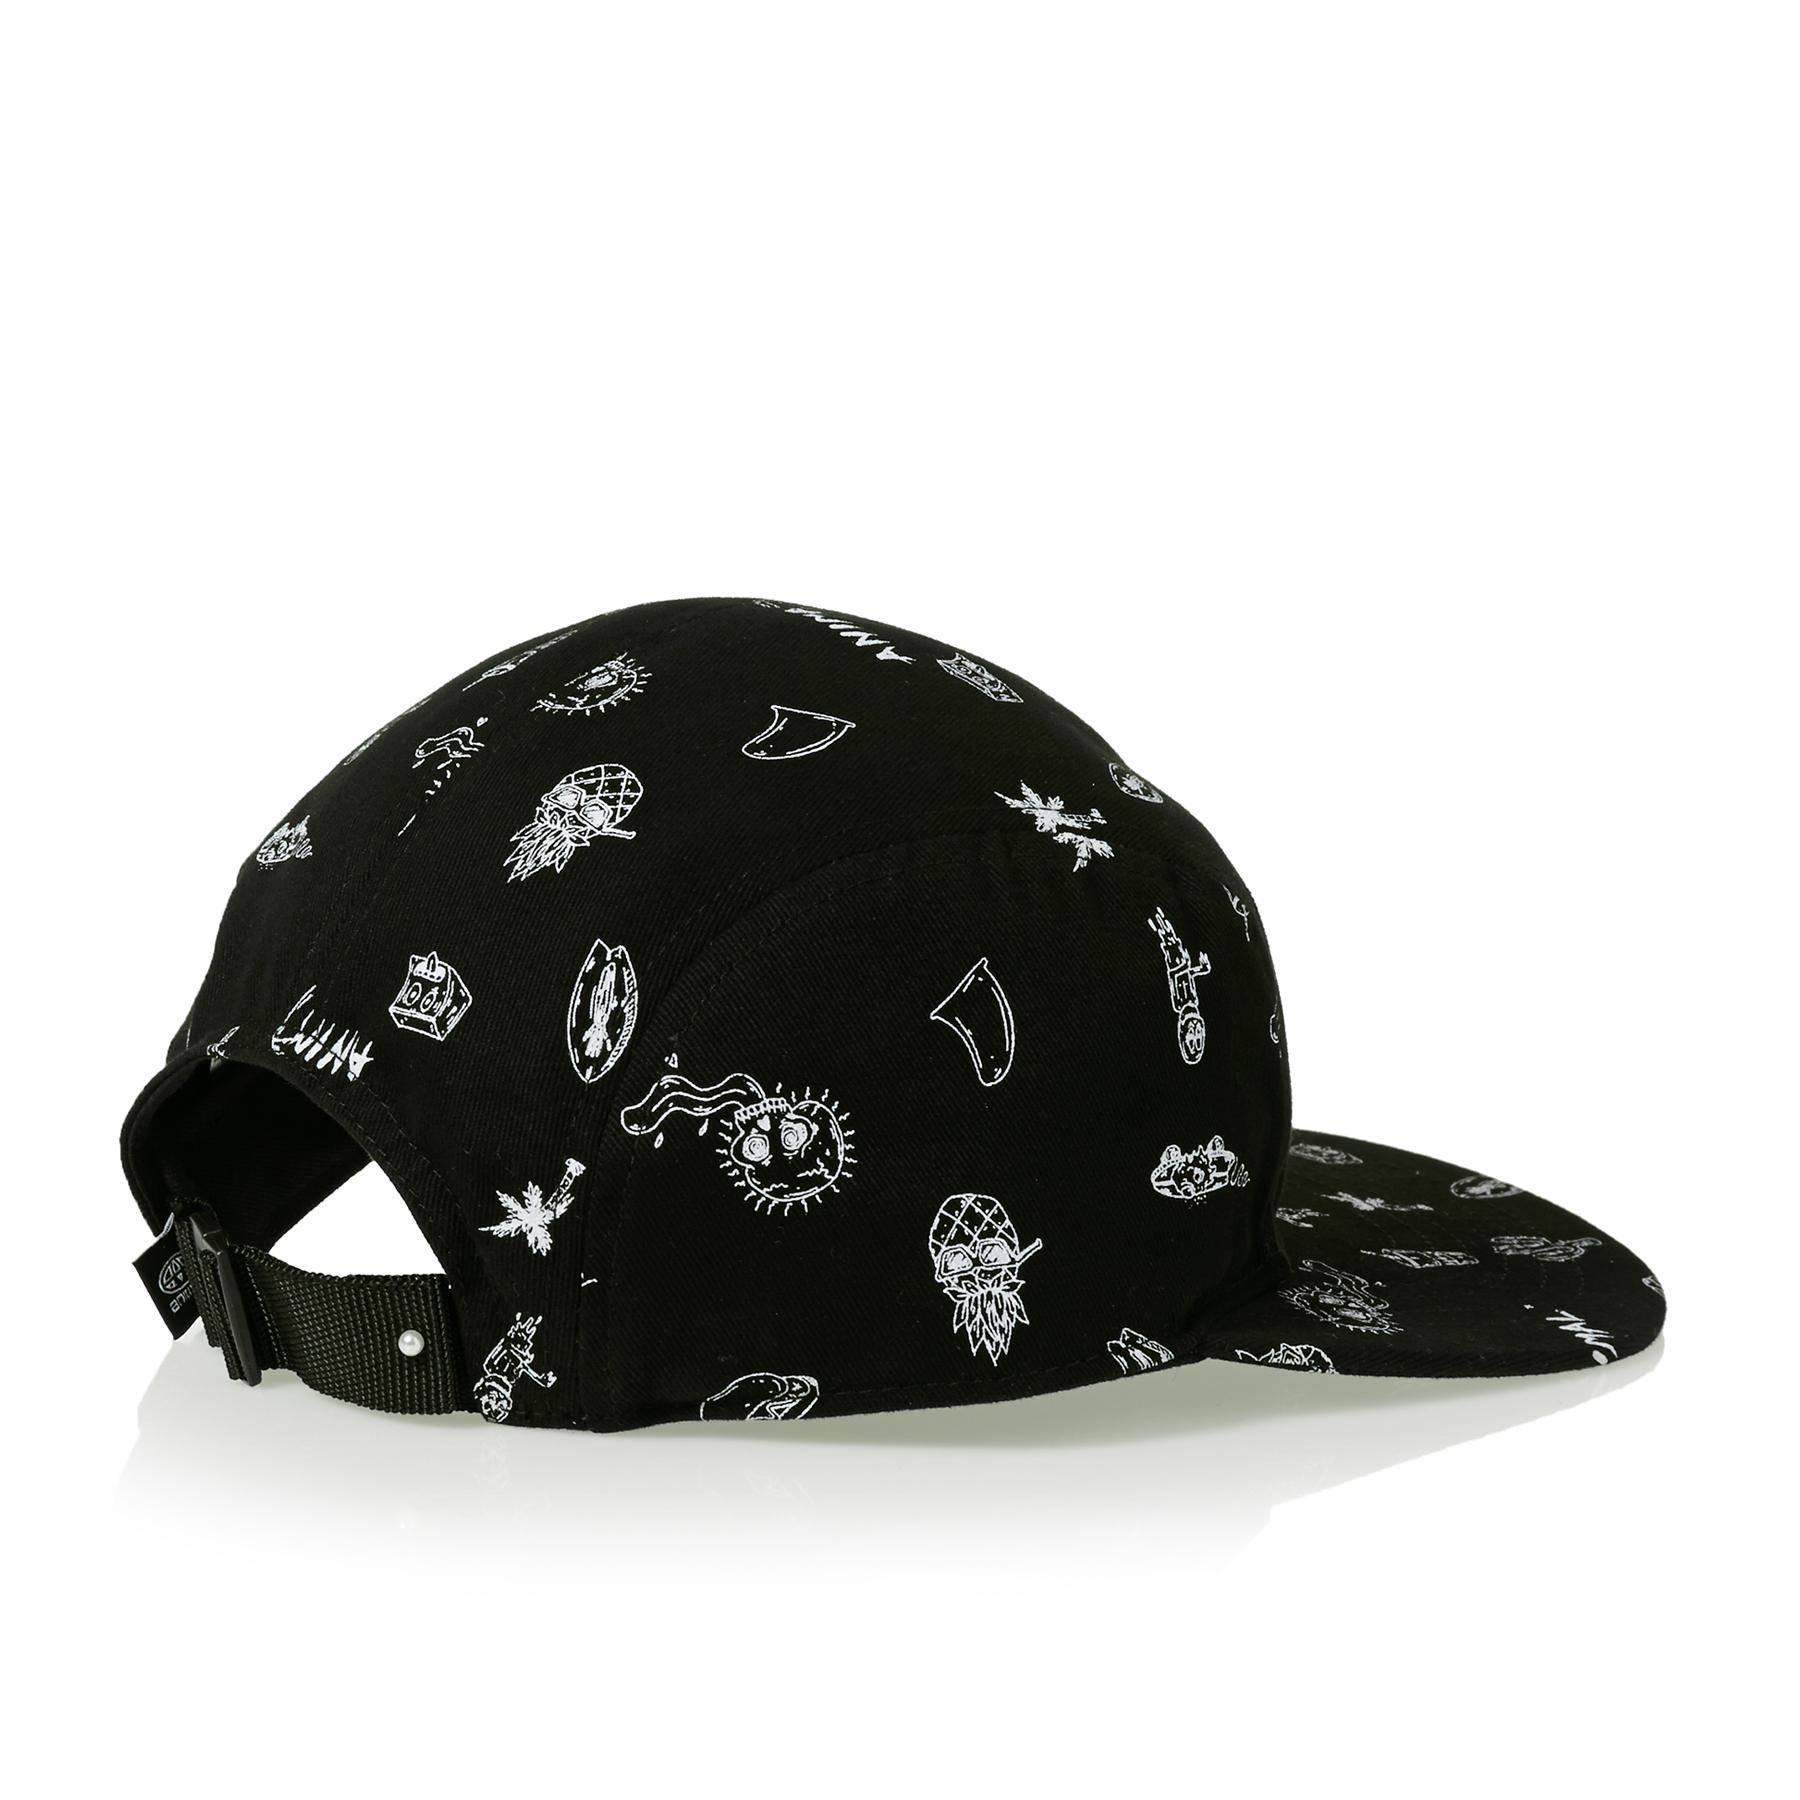 Black All Sizes Animal Taye Boys Headwear Cap